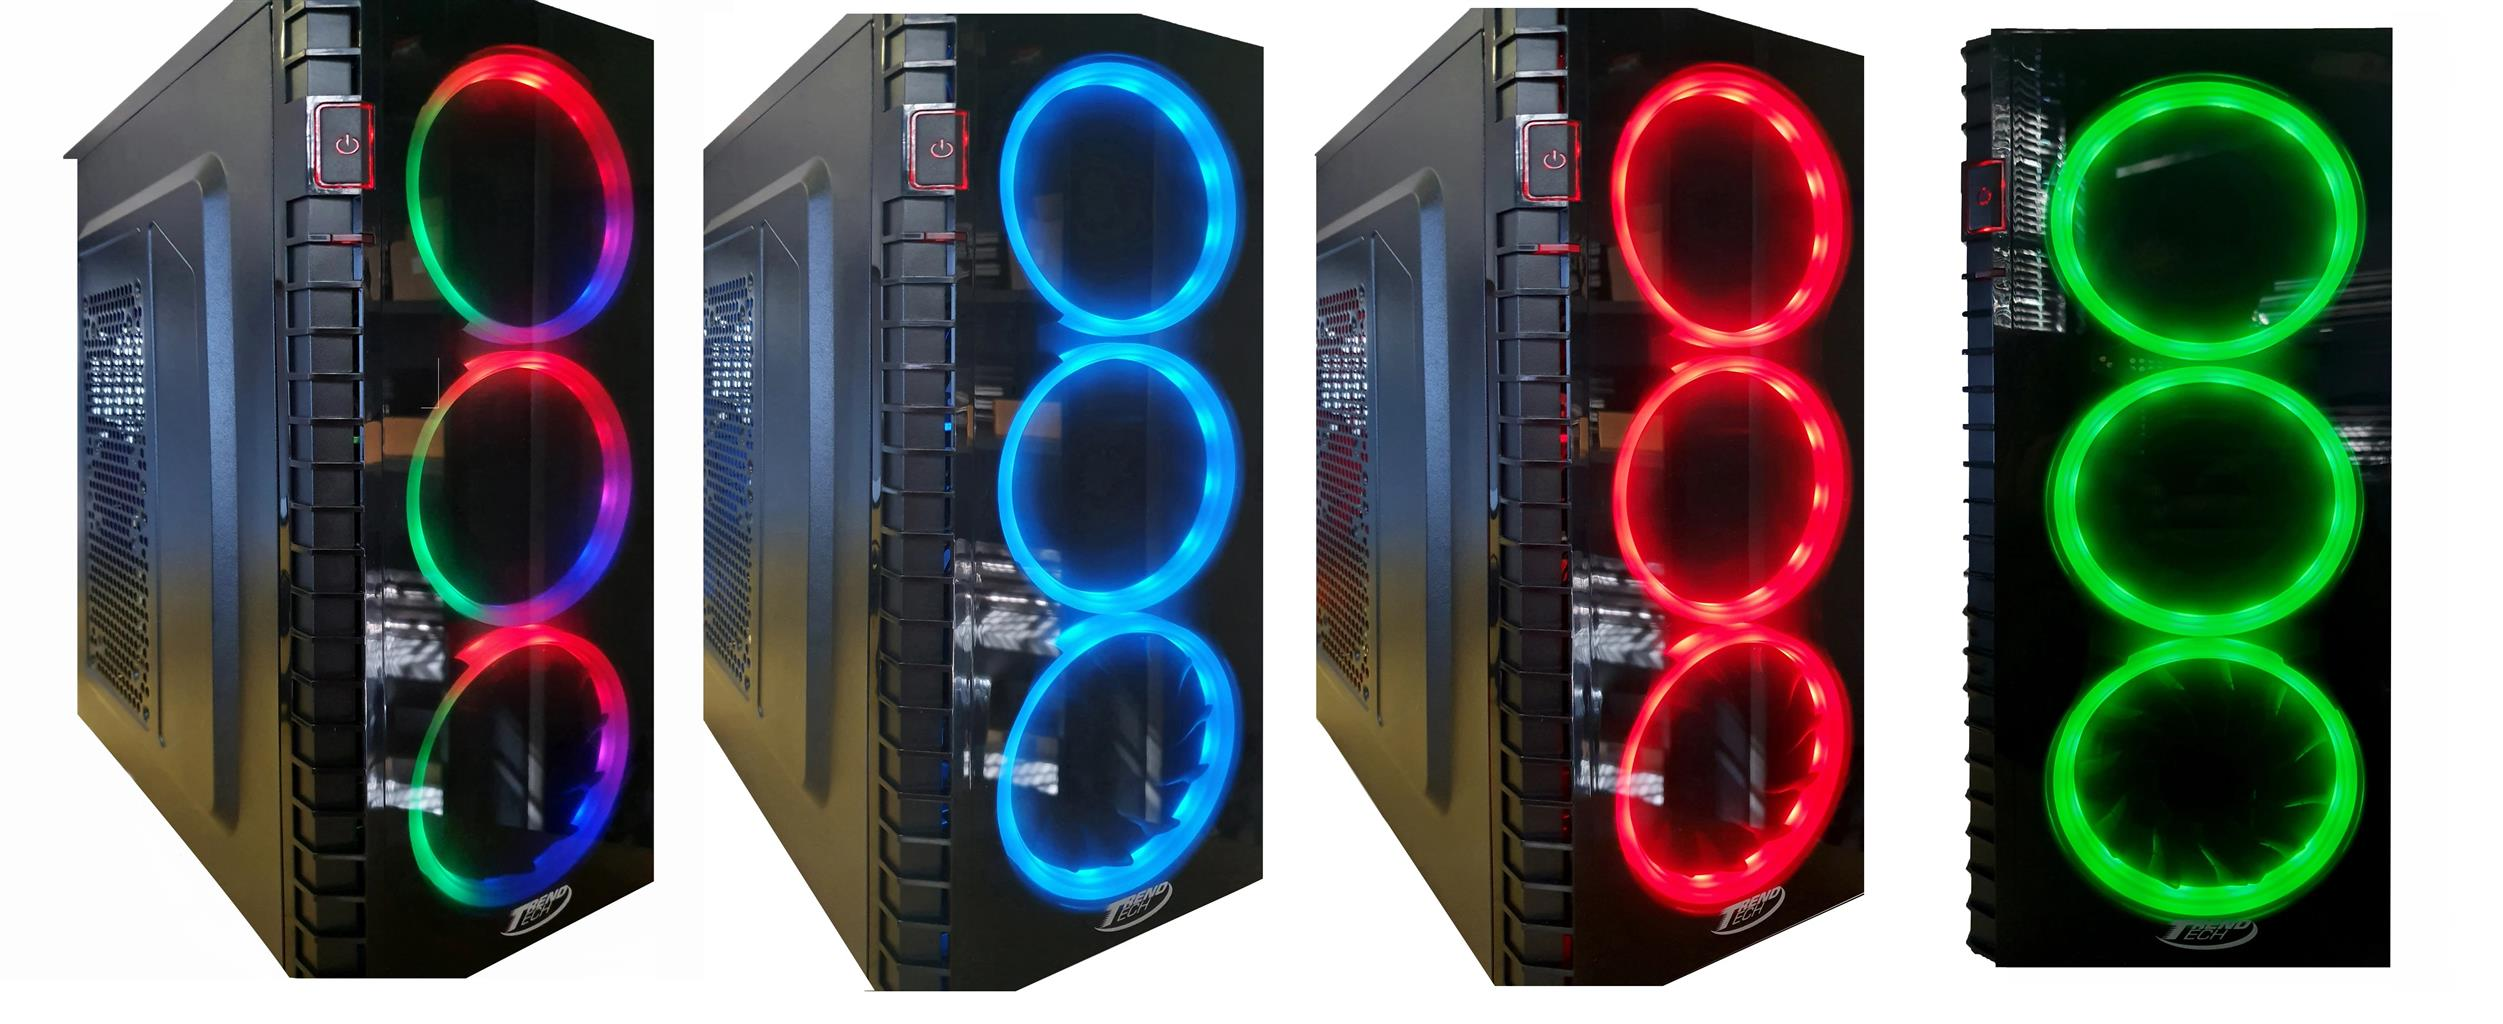 TREND TECH RGB i5 DESKTOP COMPUTER